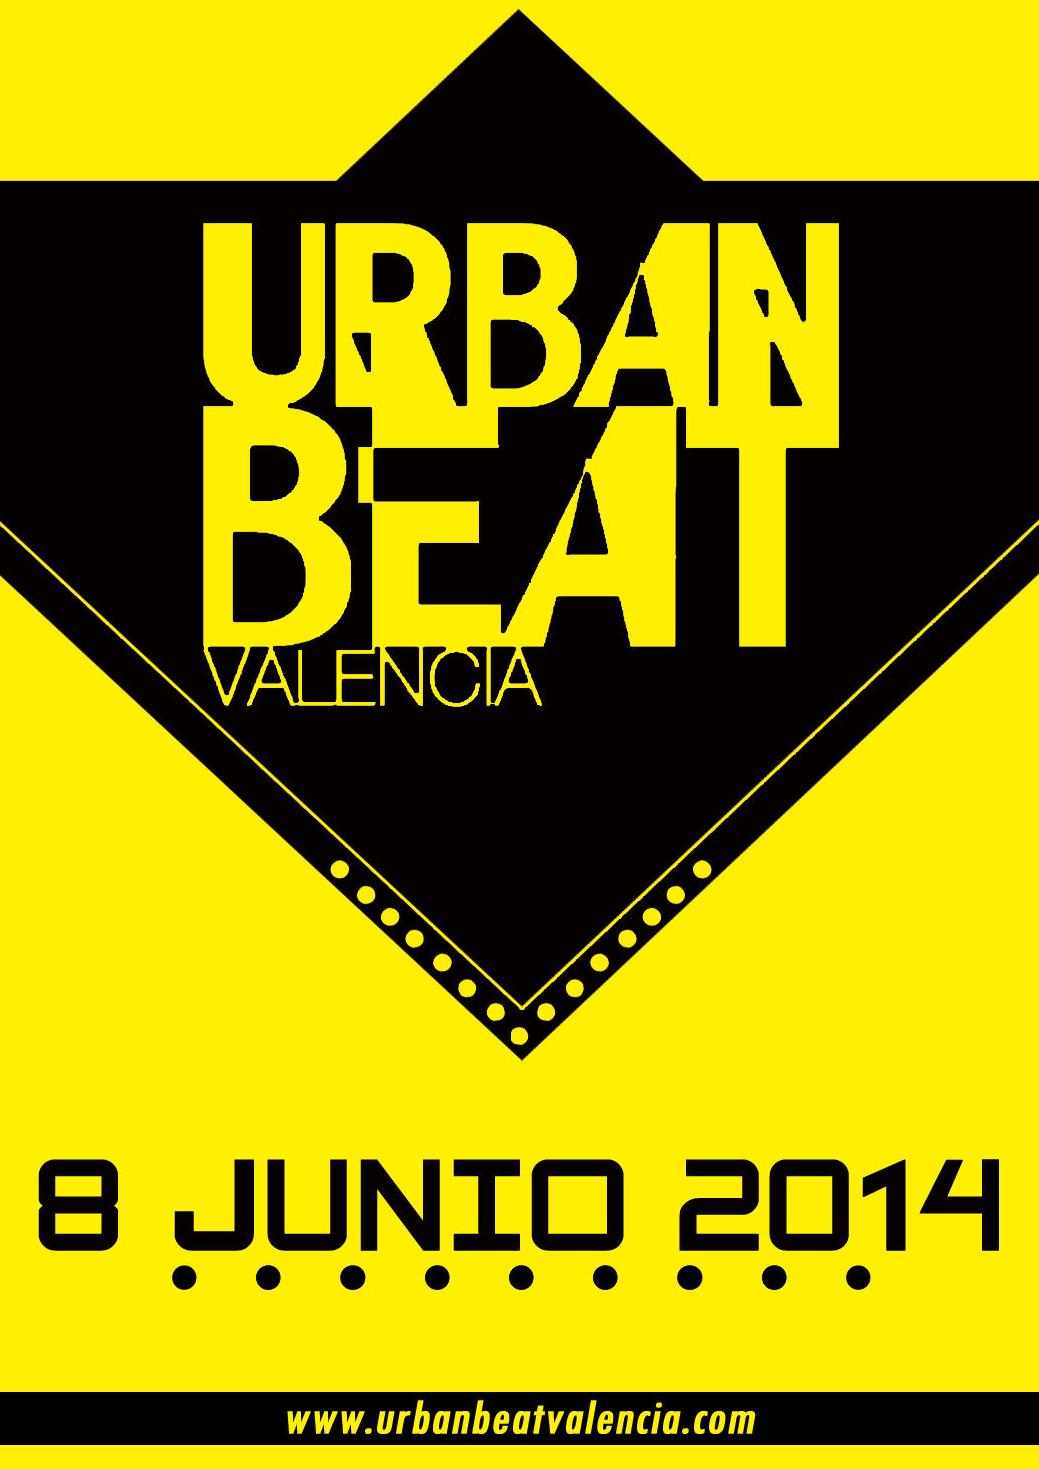 URBAN BEAT VALENCIA CAMPEONATO DE DANZA URBANA 2014